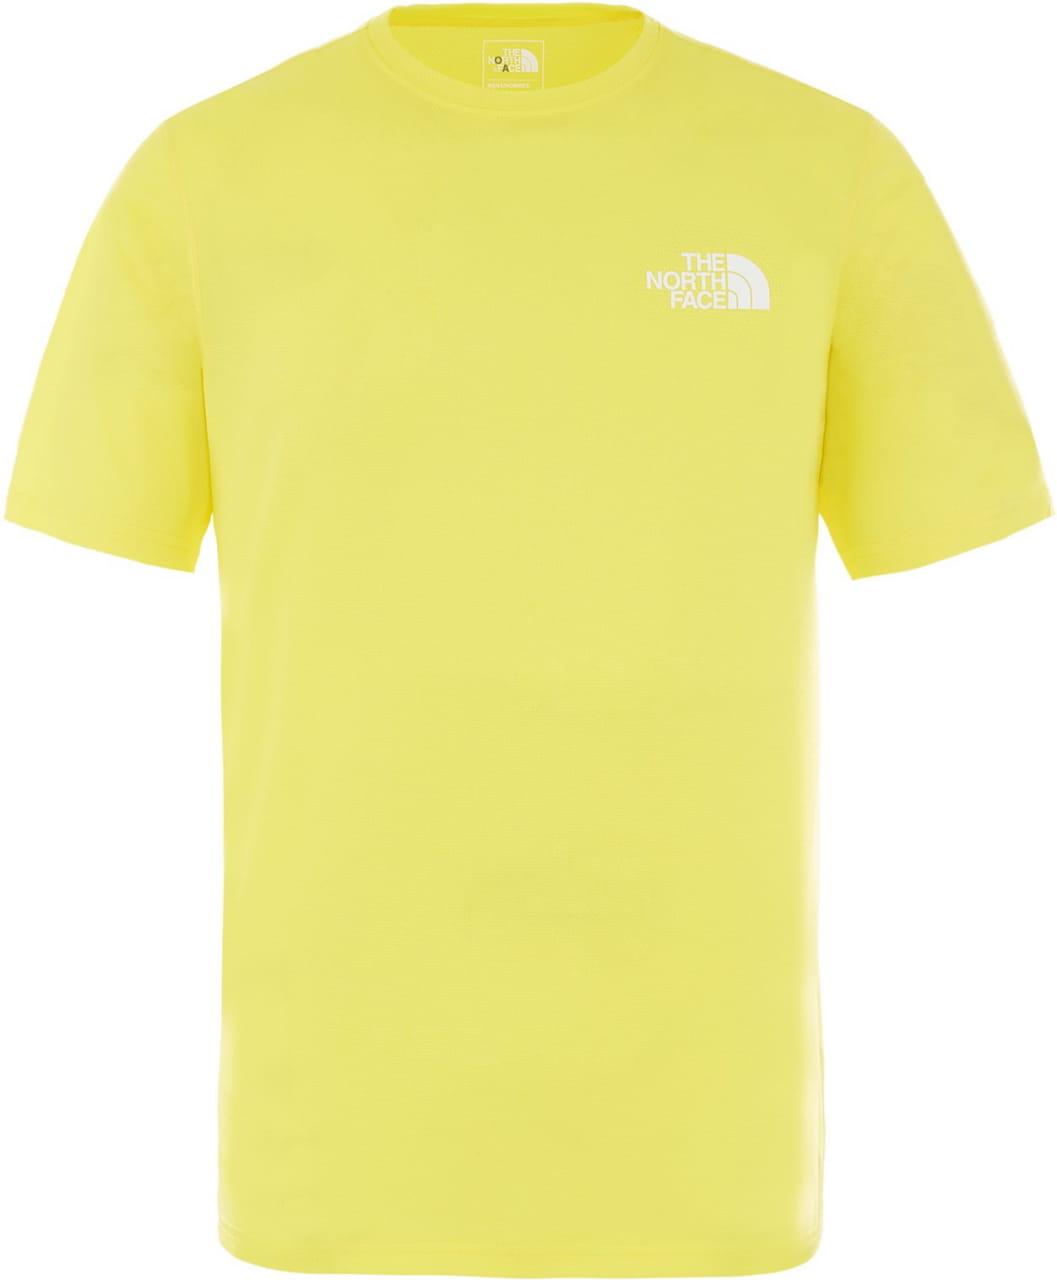 T-Shirts The North Face Men's Flex II Short-Sleeve T-Shirt